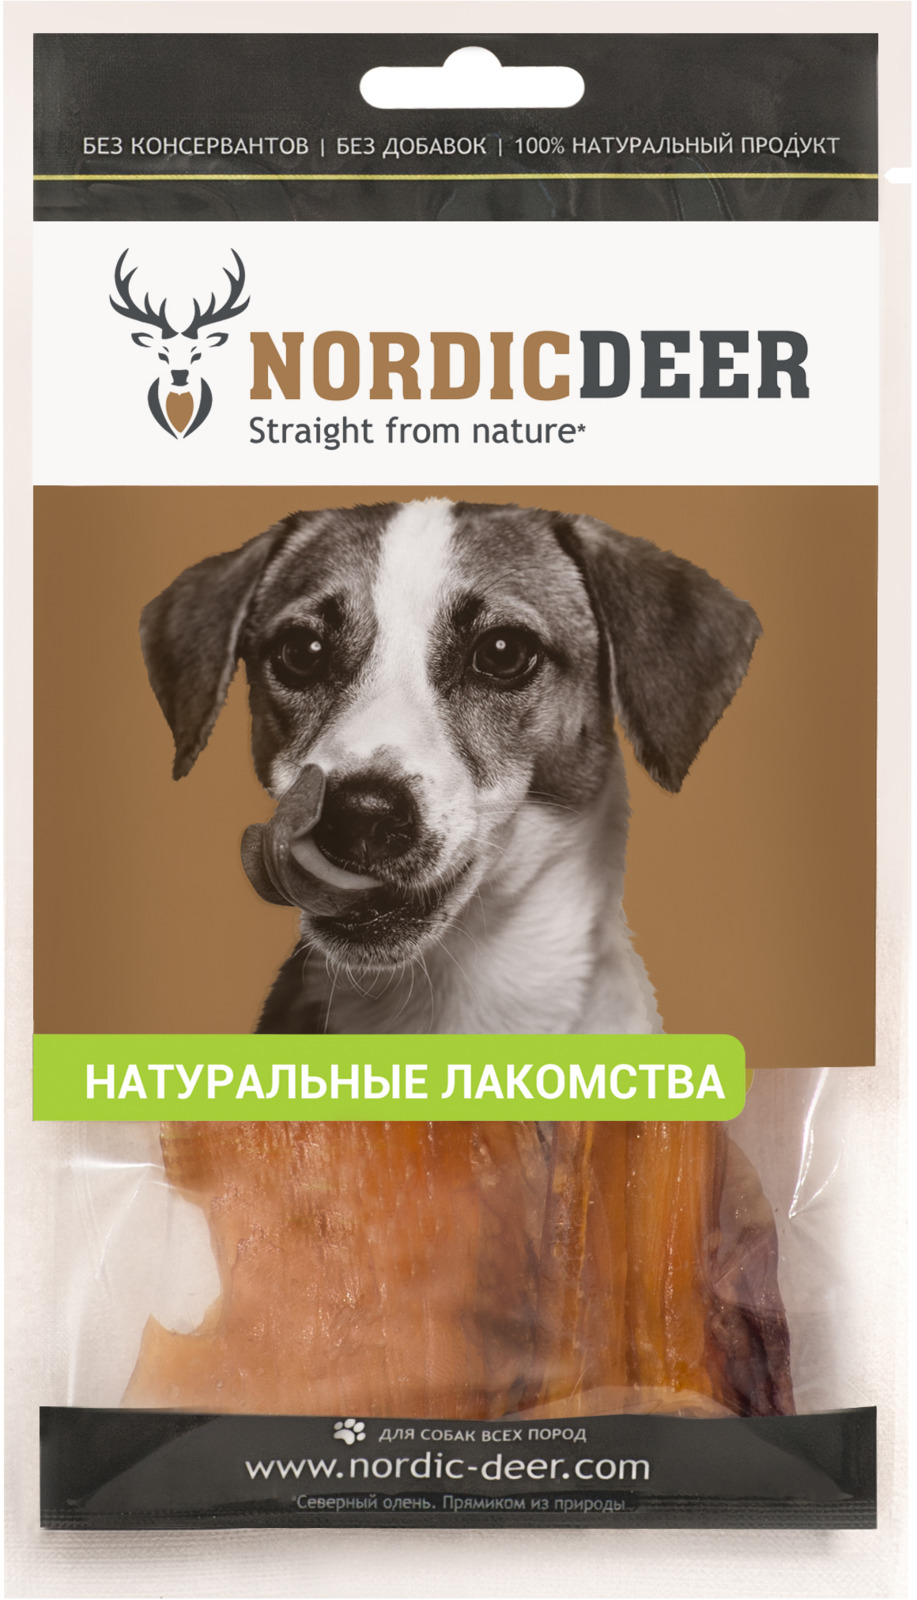 Лакомство для собак Nordic Deer Сухожилия говяжьи, 5 см, 40 г nordic modern living room bedroom background simple english deer head decorative